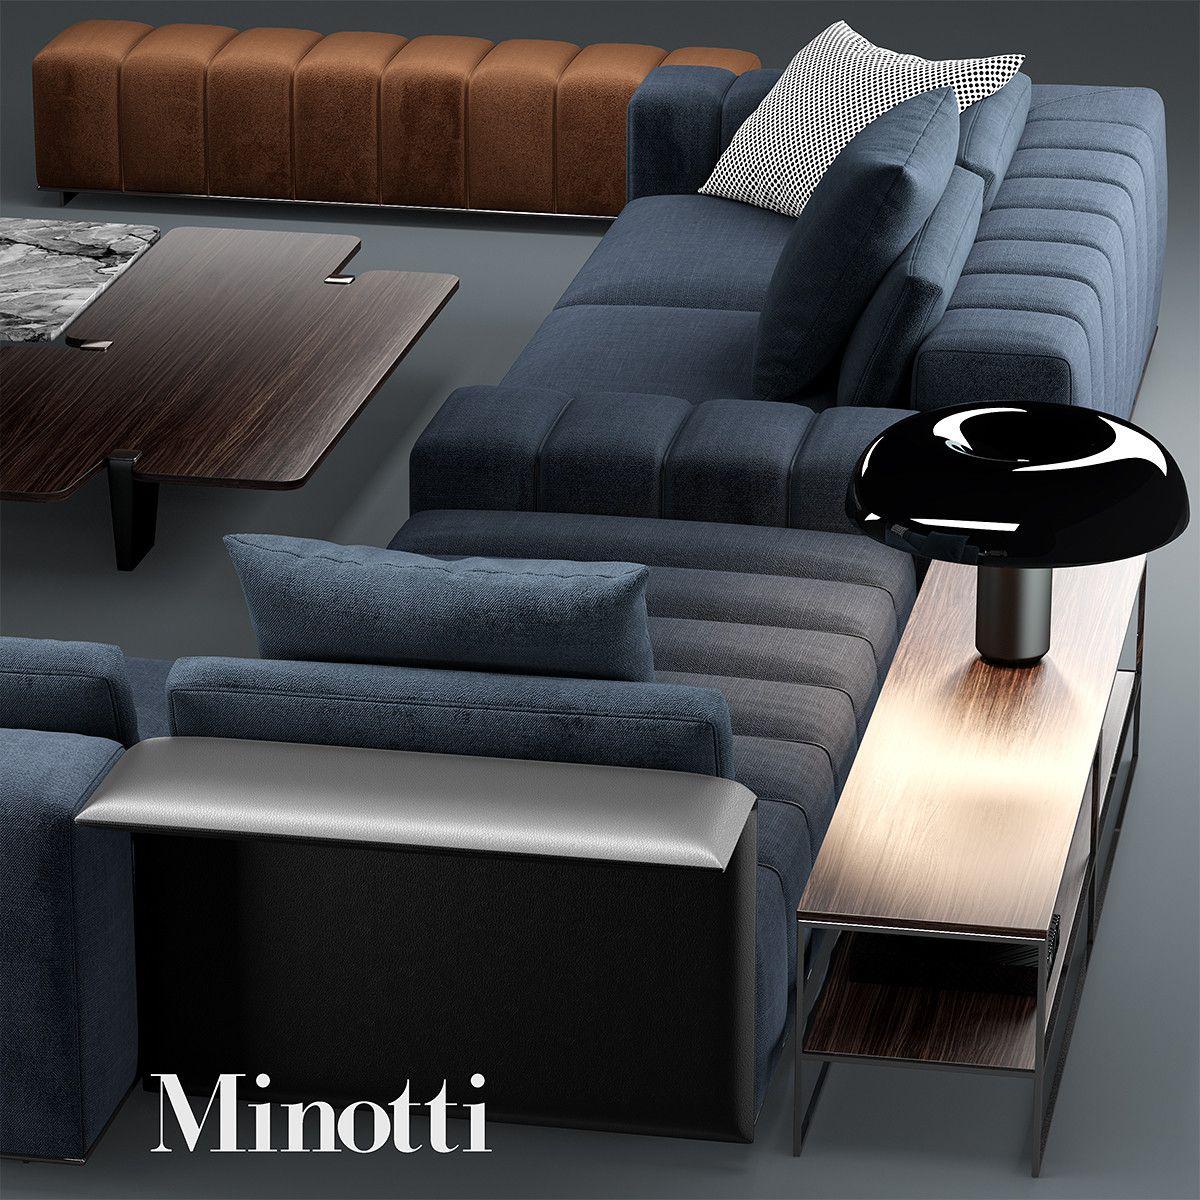 3d sofa minotti freeman model 777 pinterest desk. Black Bedroom Furniture Sets. Home Design Ideas